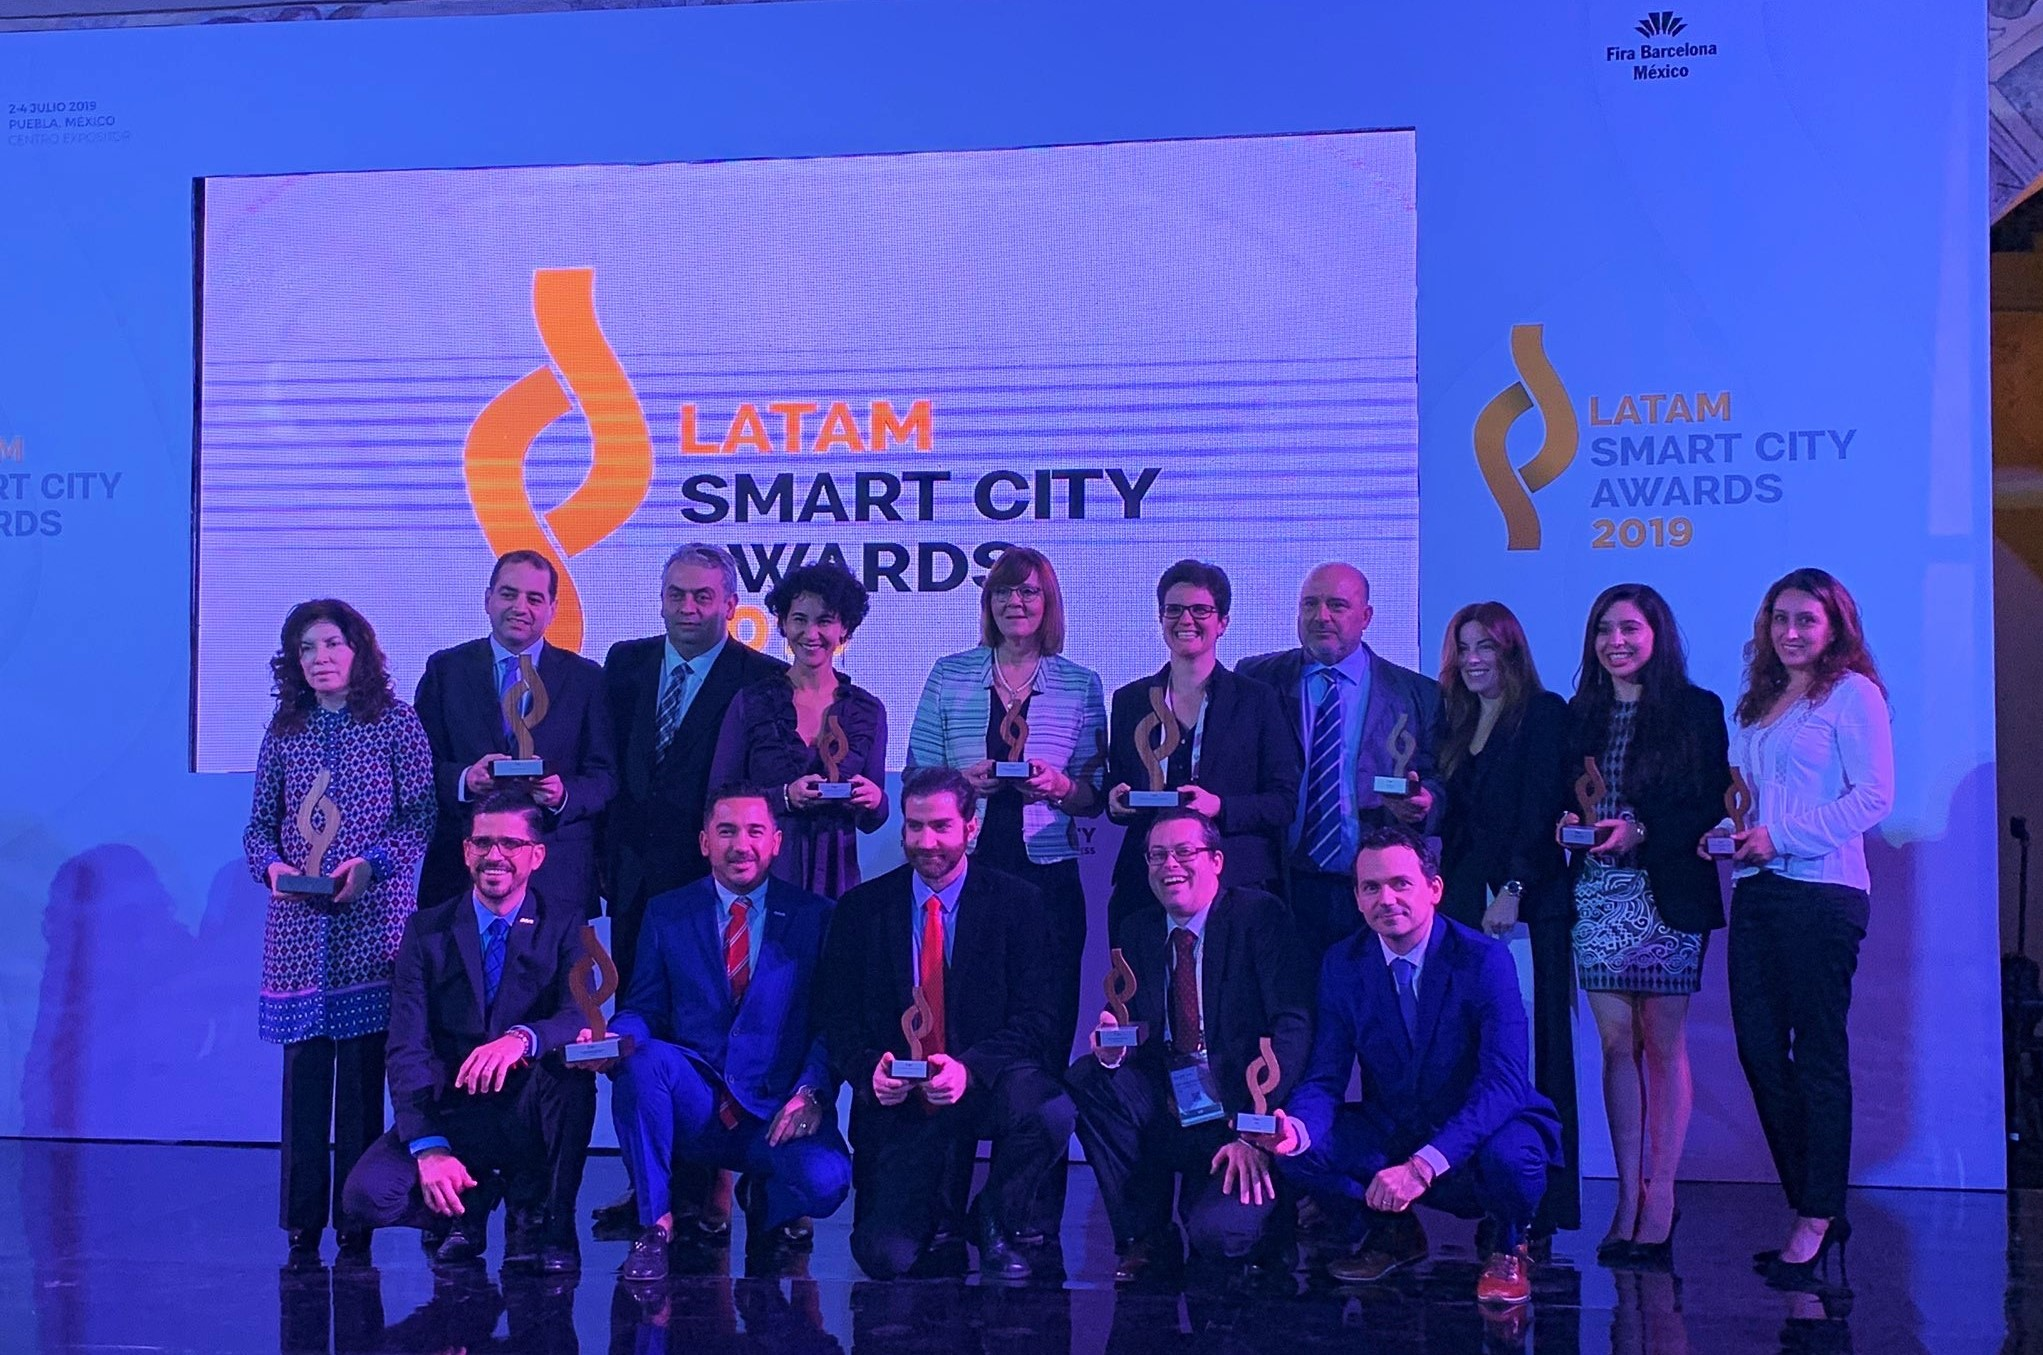 Octubre, la fecha para los Latam Smart City Awards en Mérida